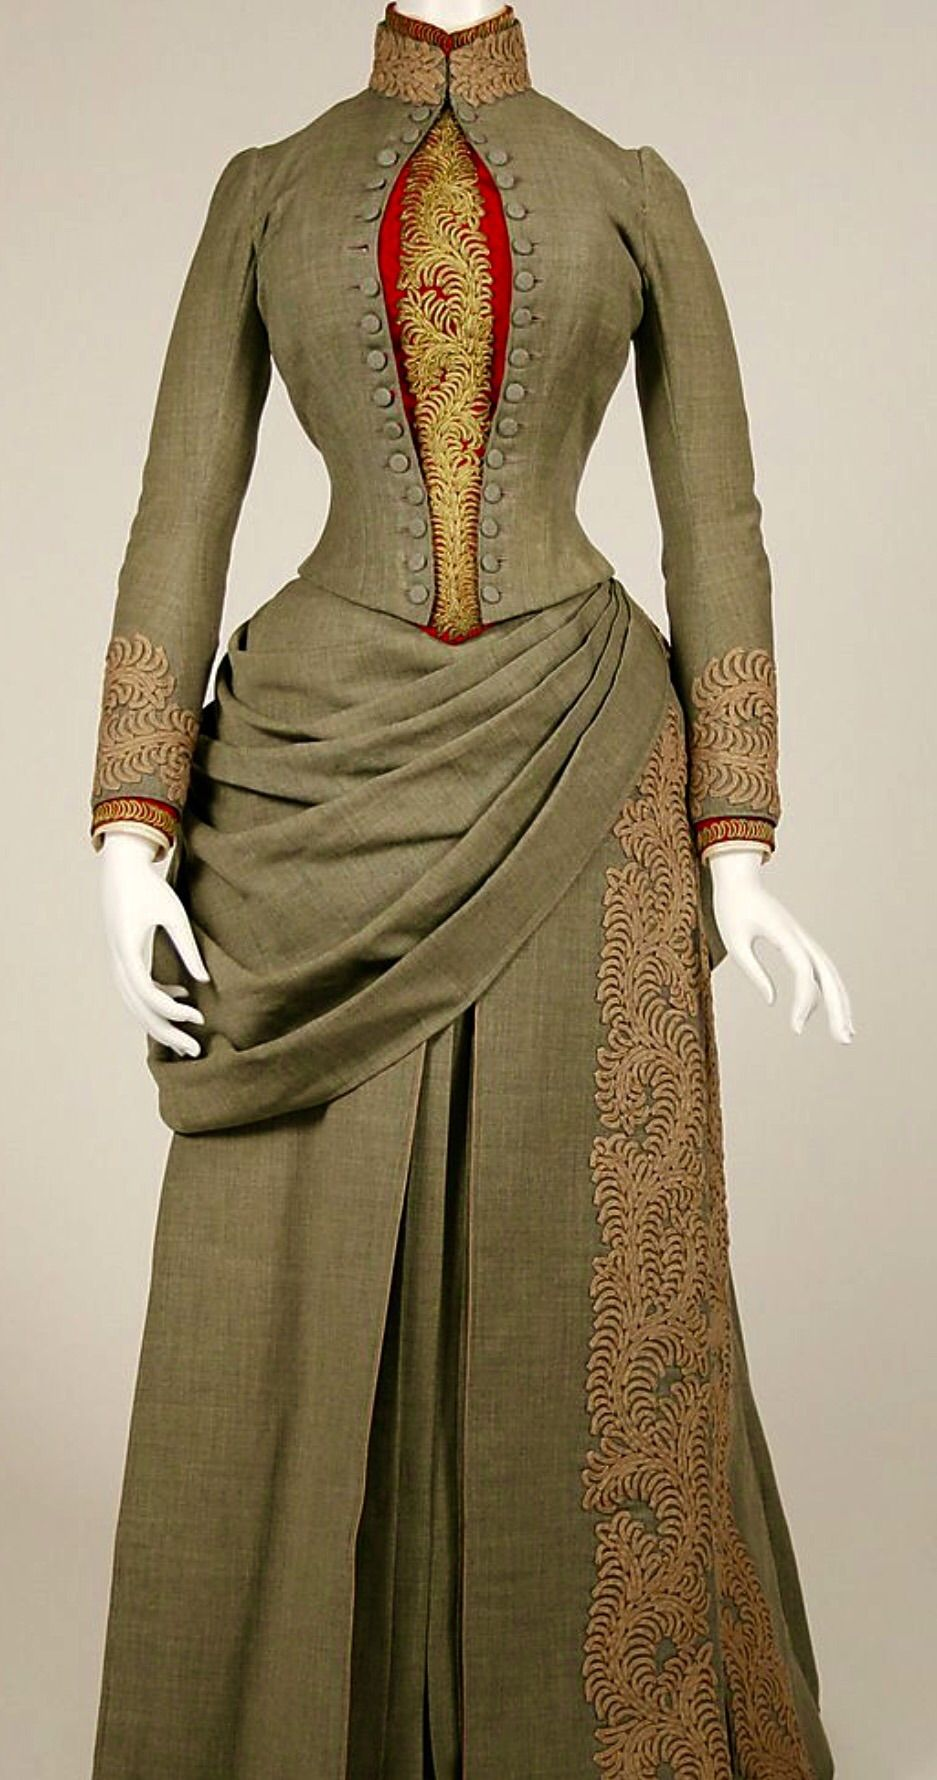 1887 American Traveling Dress